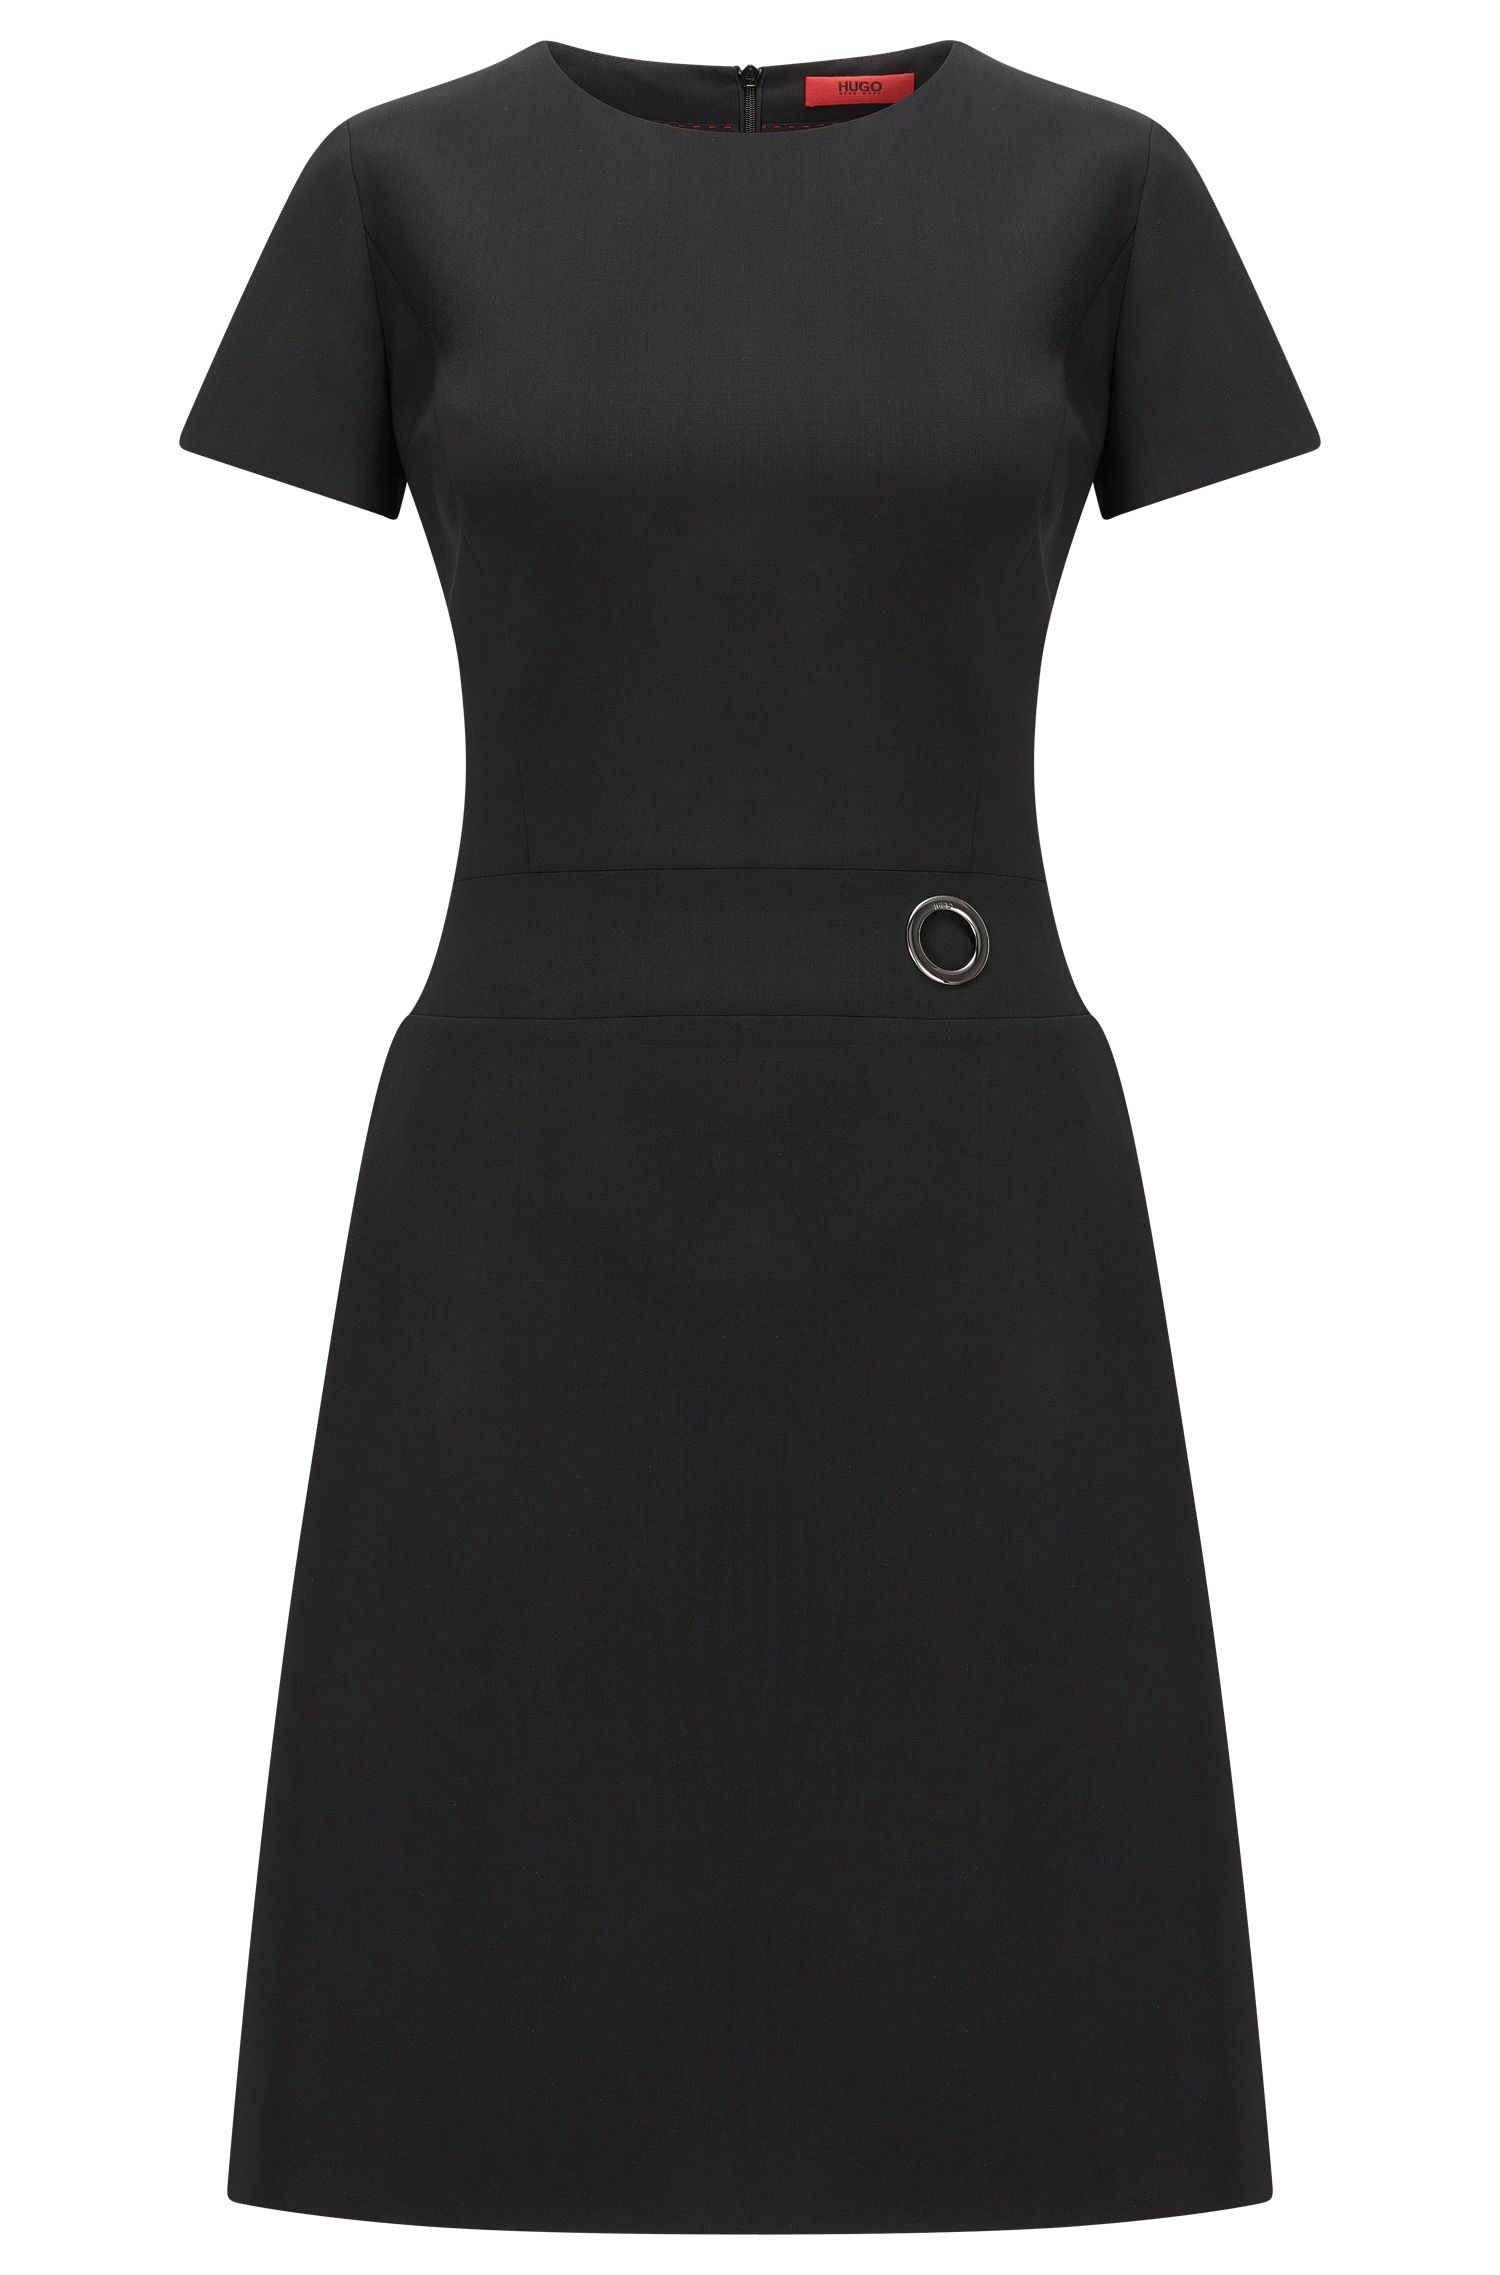 Short-sleeved dress in virgin wool blend